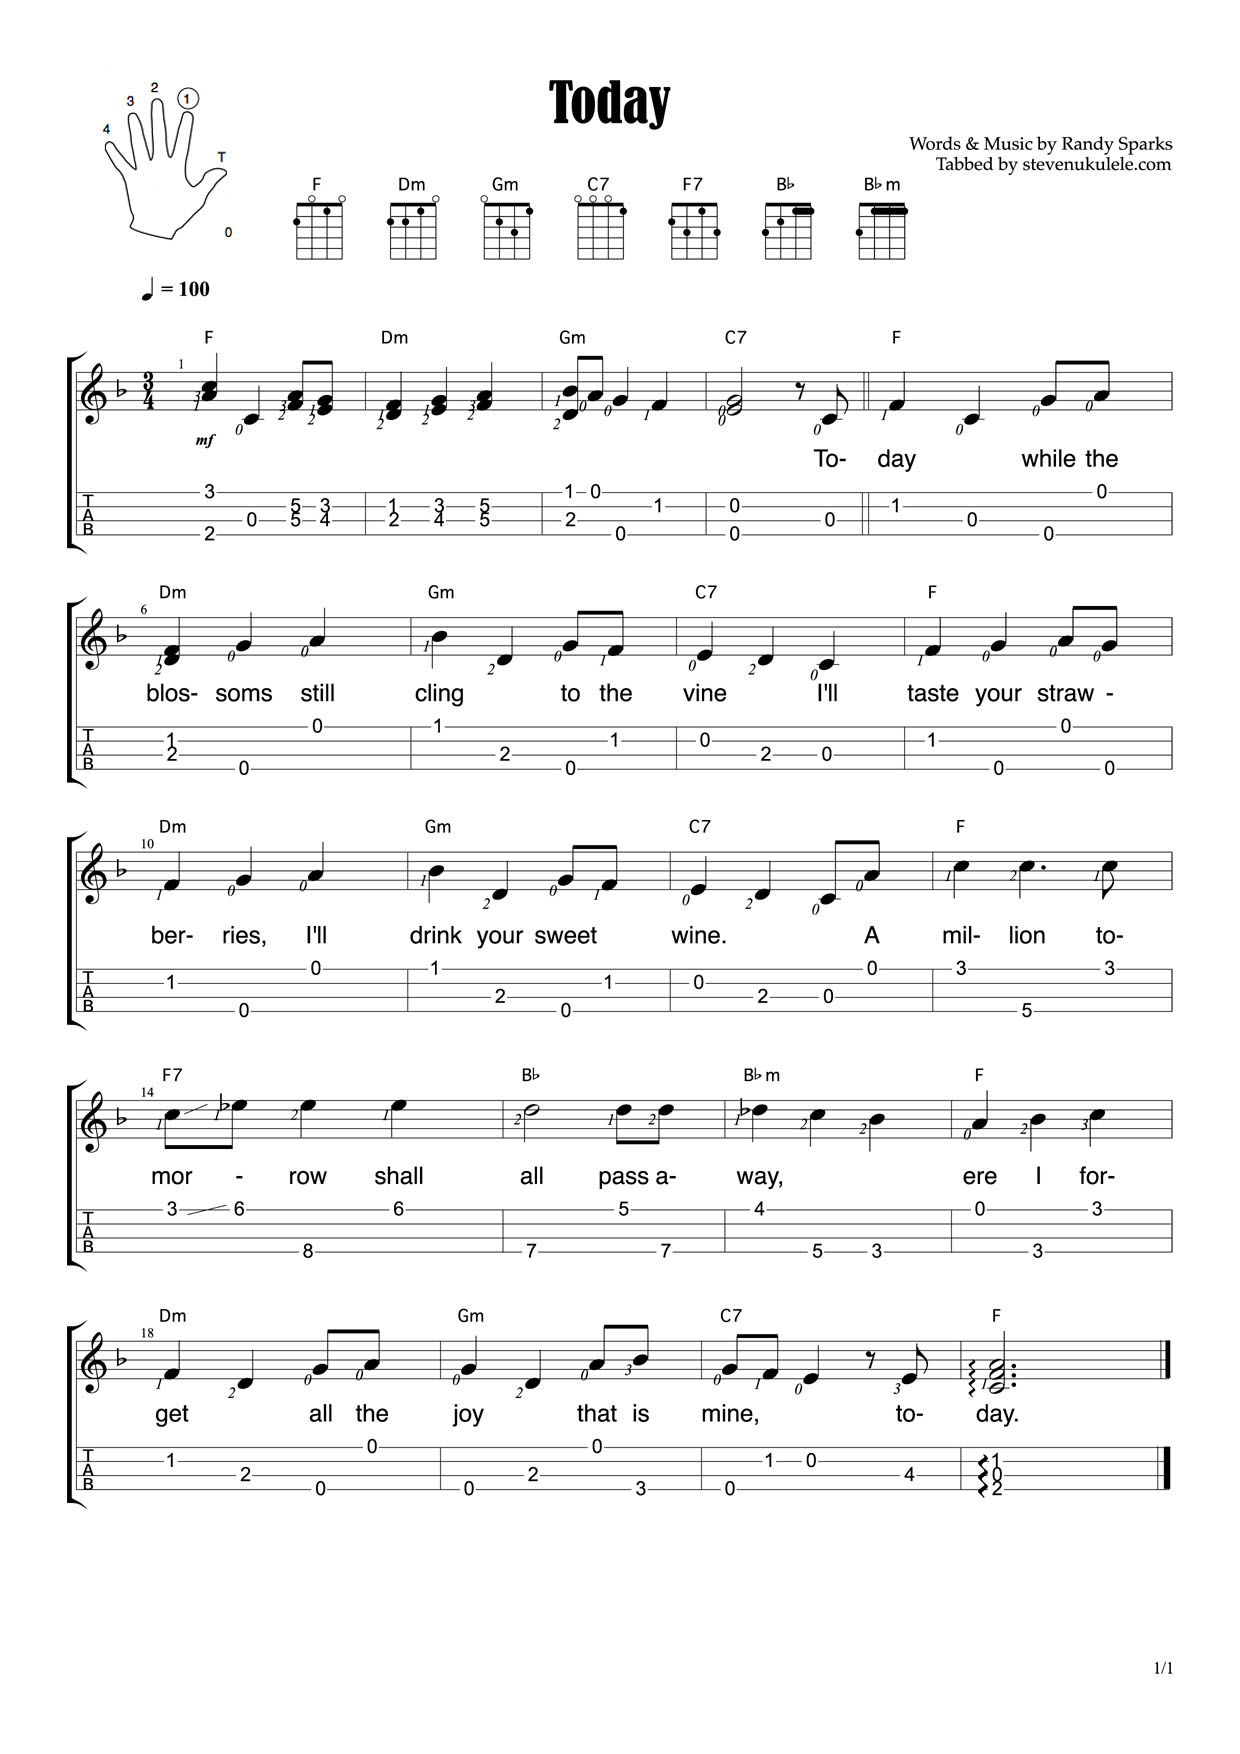 Today Chord Solo | steven.ukulele